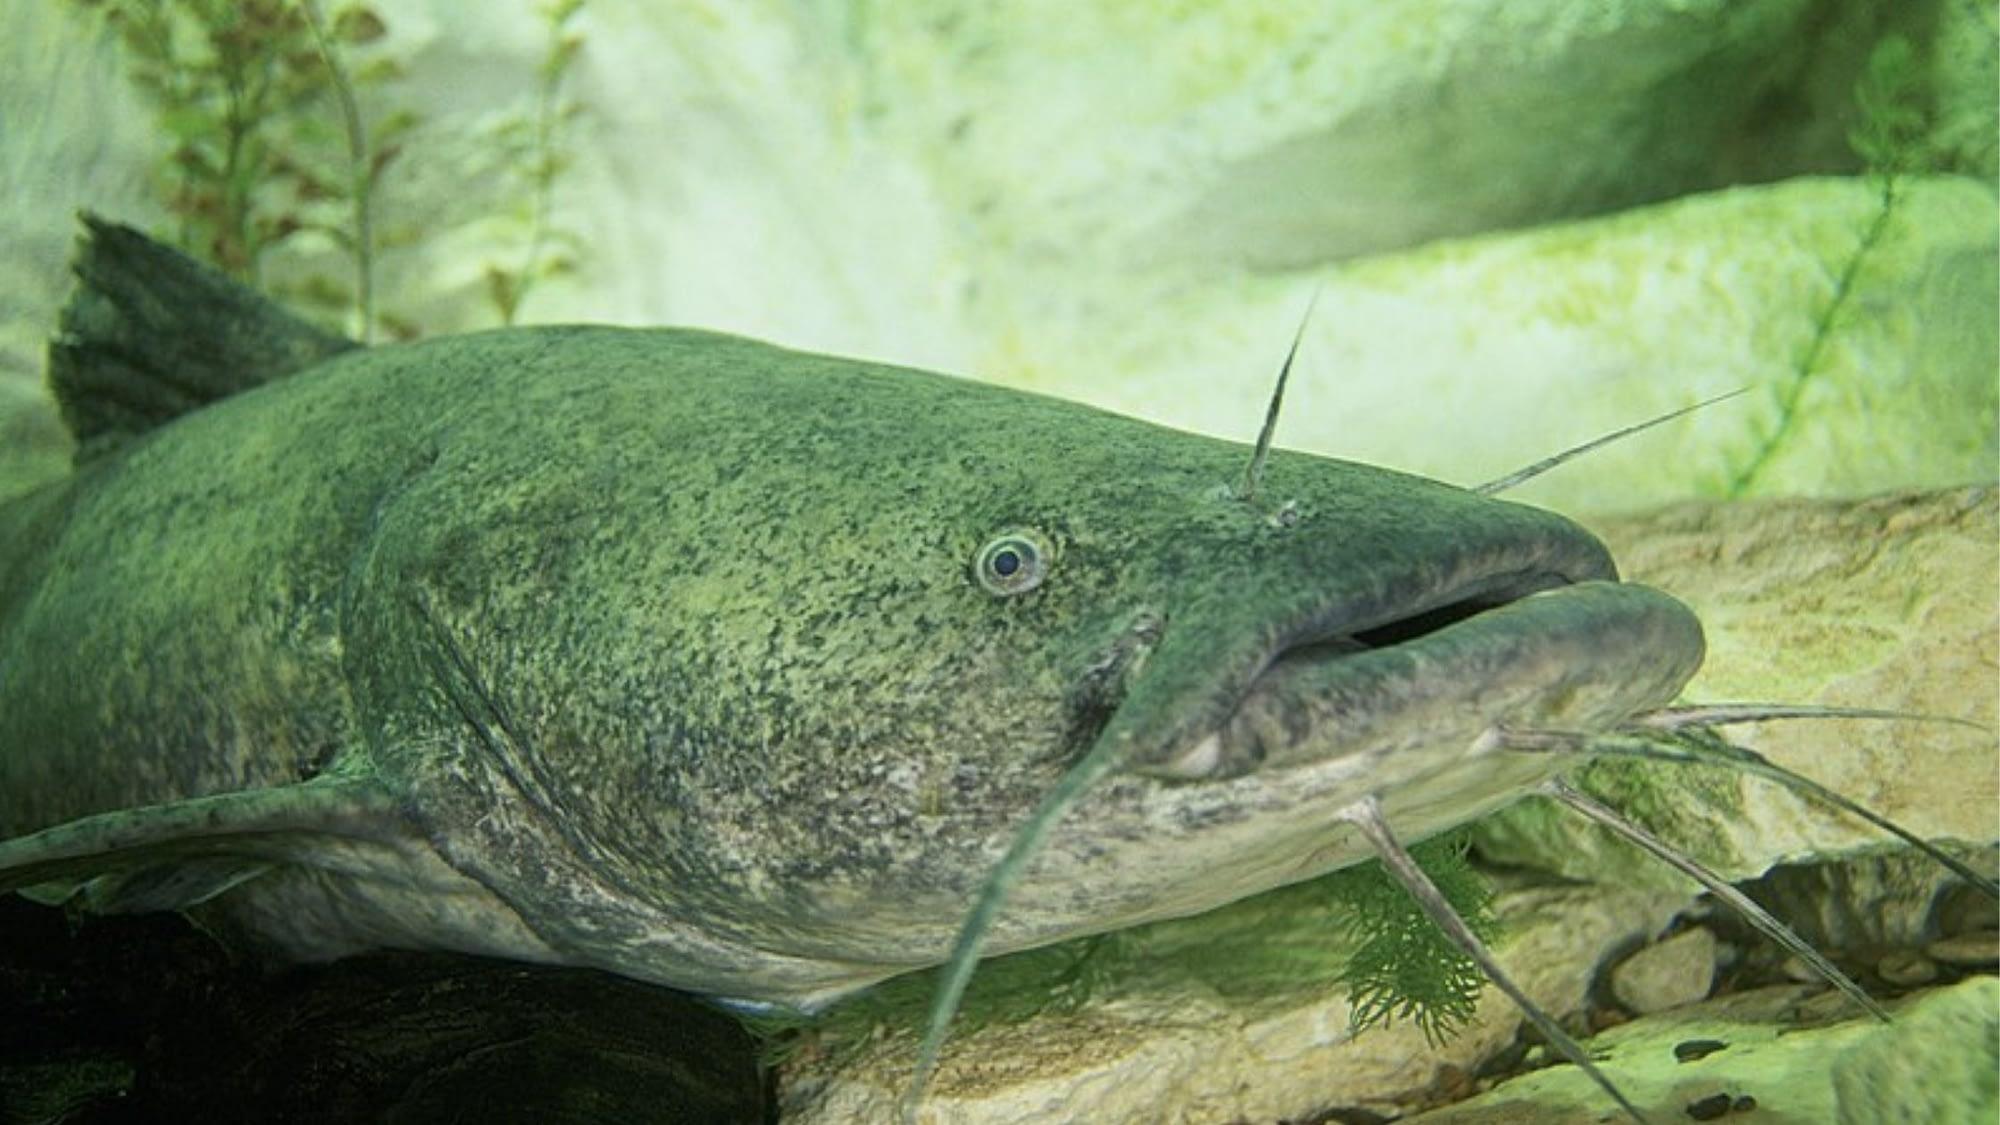 How to catch flathead catfish